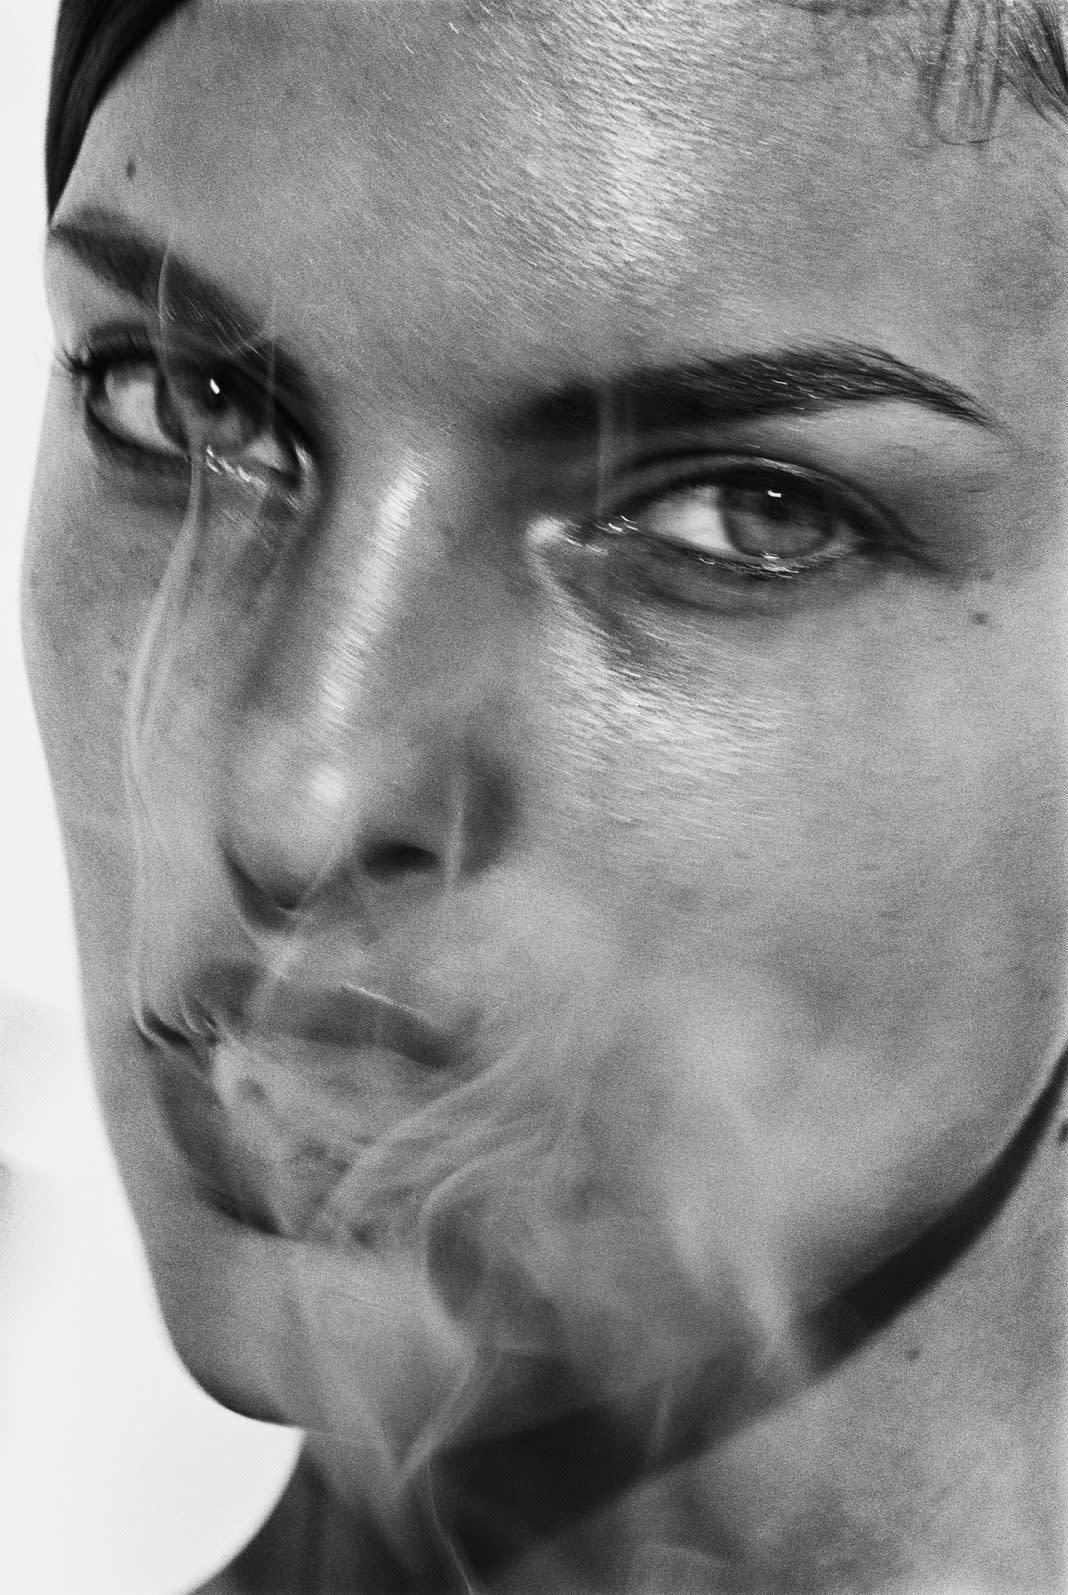 Linda evangelista by peter lindberg naked (72 images)